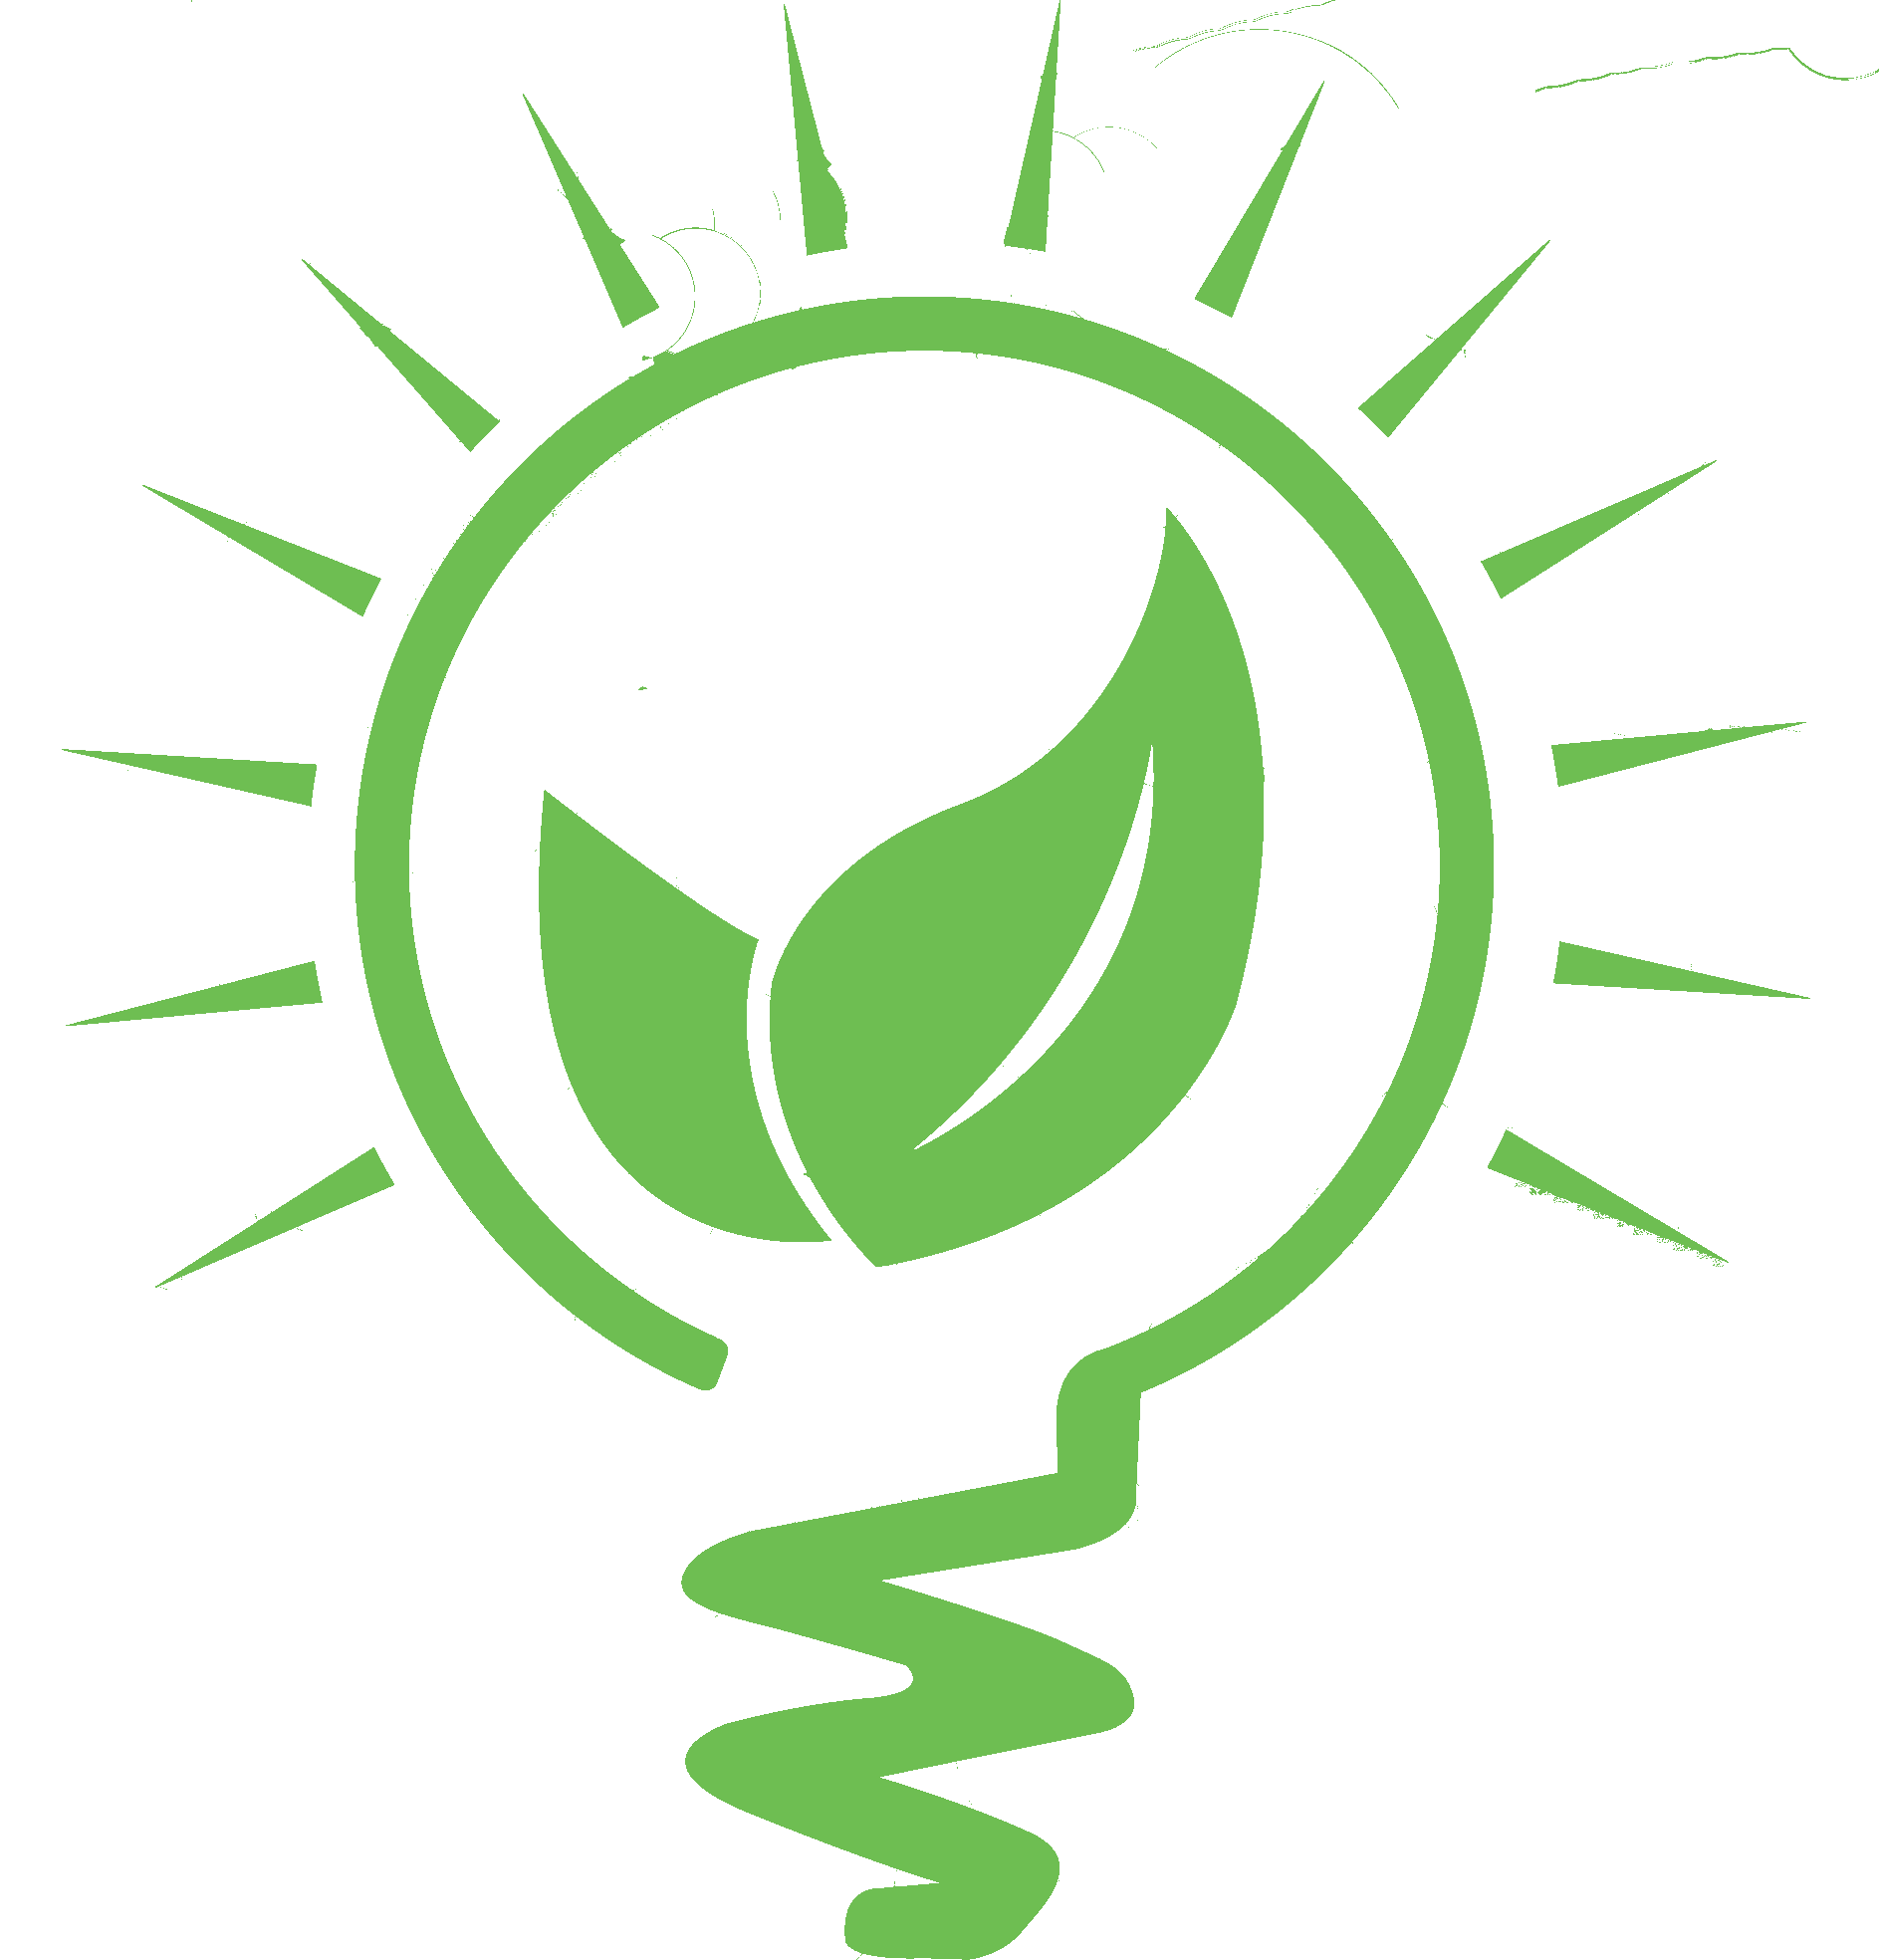 Saving energy clipart jpg freeuse library Save Energy PNG Clipart | PNG All jpg freeuse library